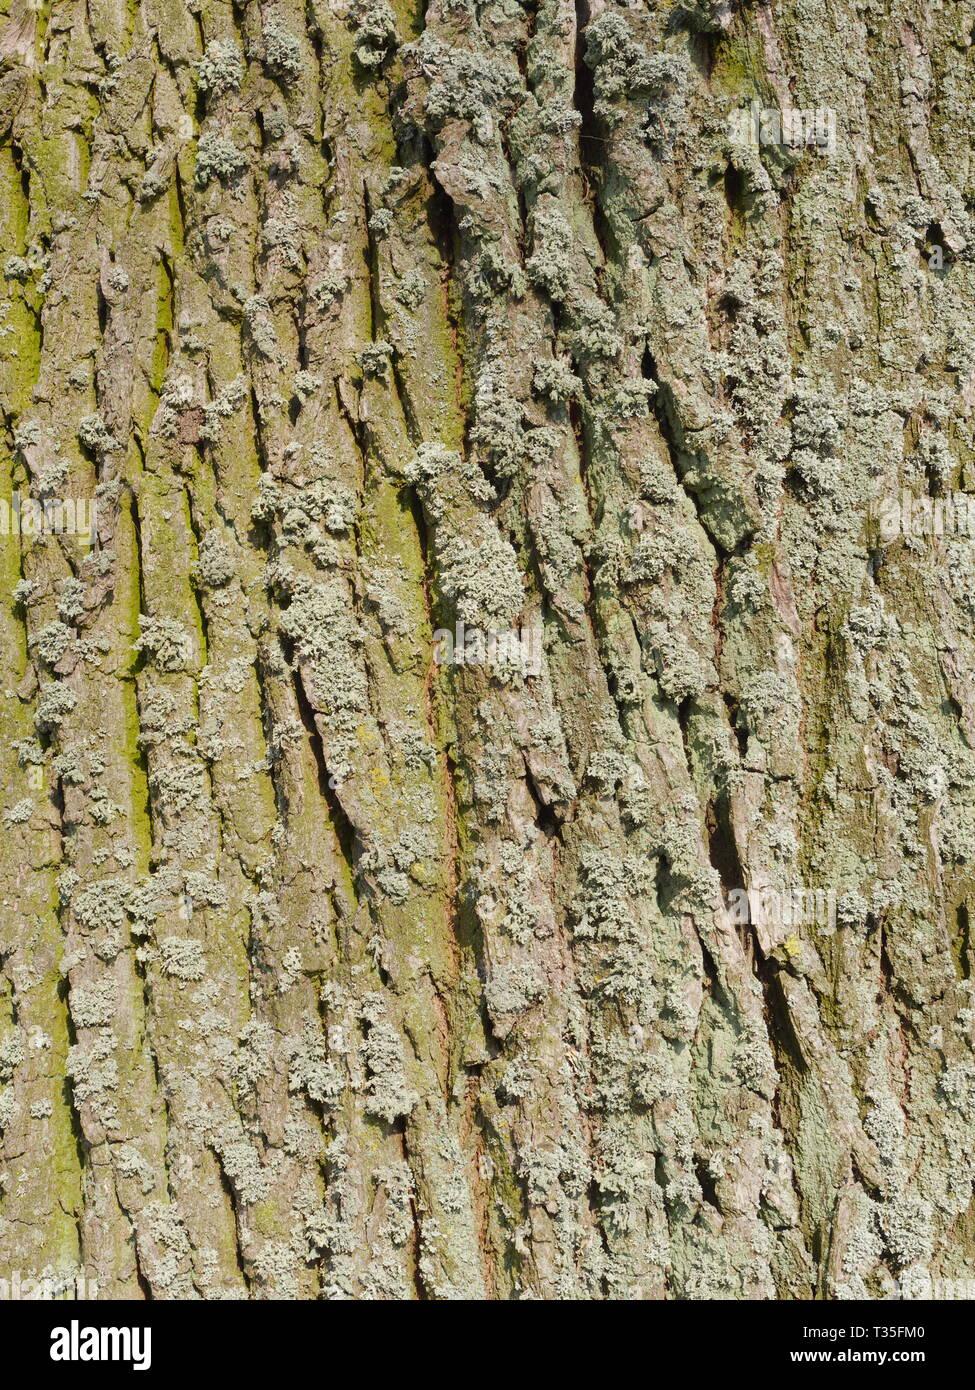 Tree bark (horse chestnut tree [Aesculus hippocastanum]) - Stock Image